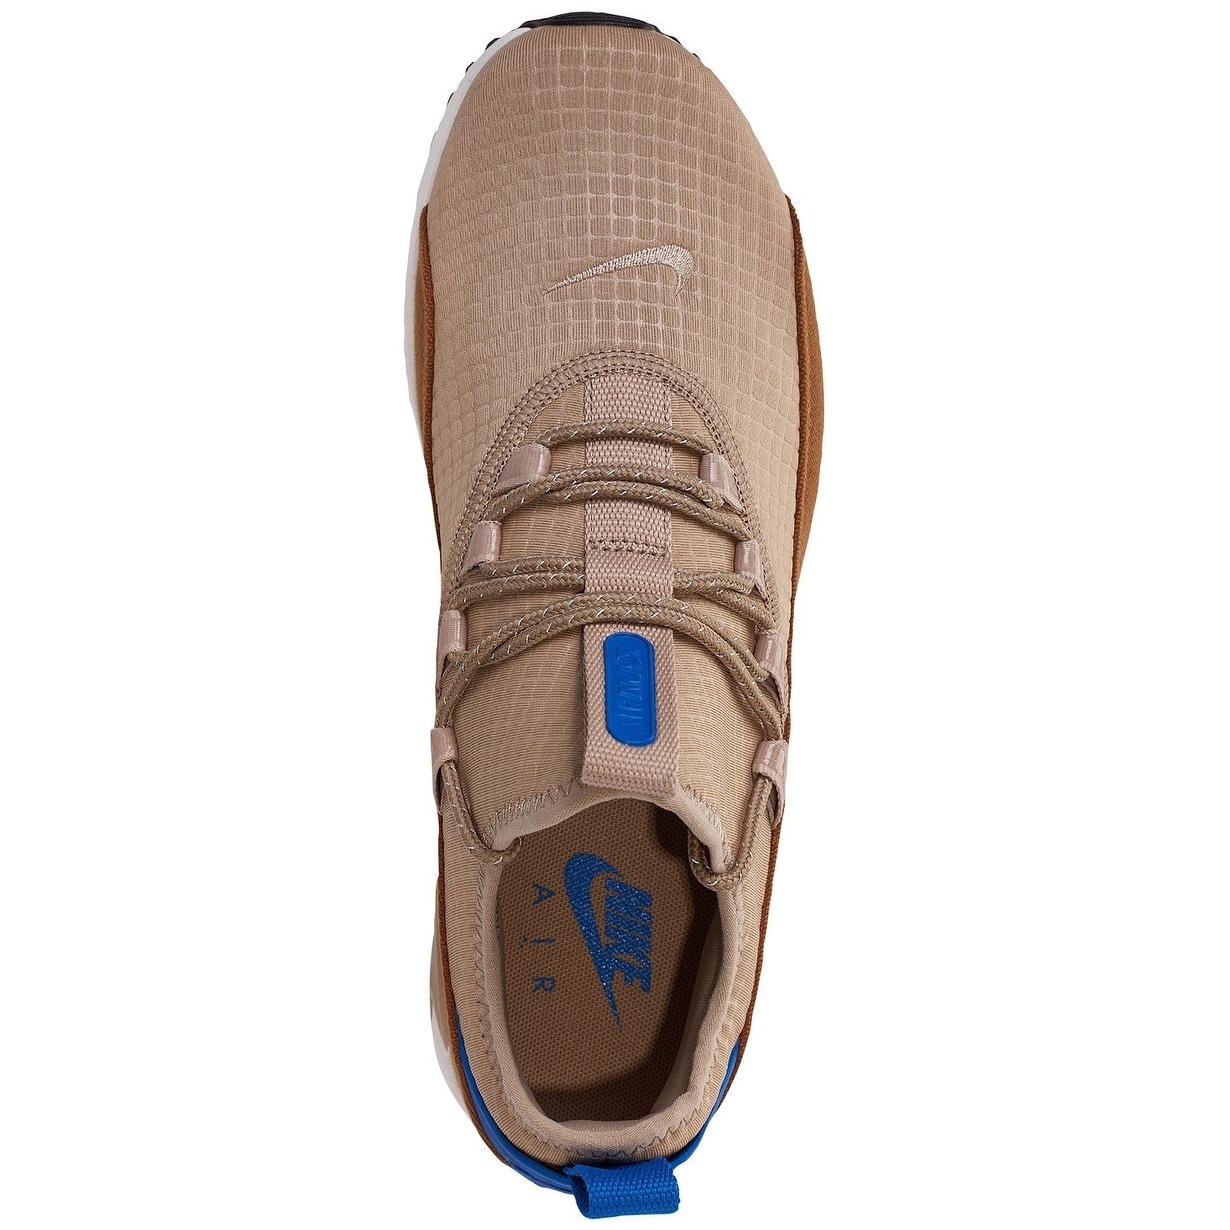 check out 844e8 72774 Shop Nike Men s Air Max 90 EZ Dessert Ochre (AO1745 700) - Free Shipping  Today - Overstock - 25557649